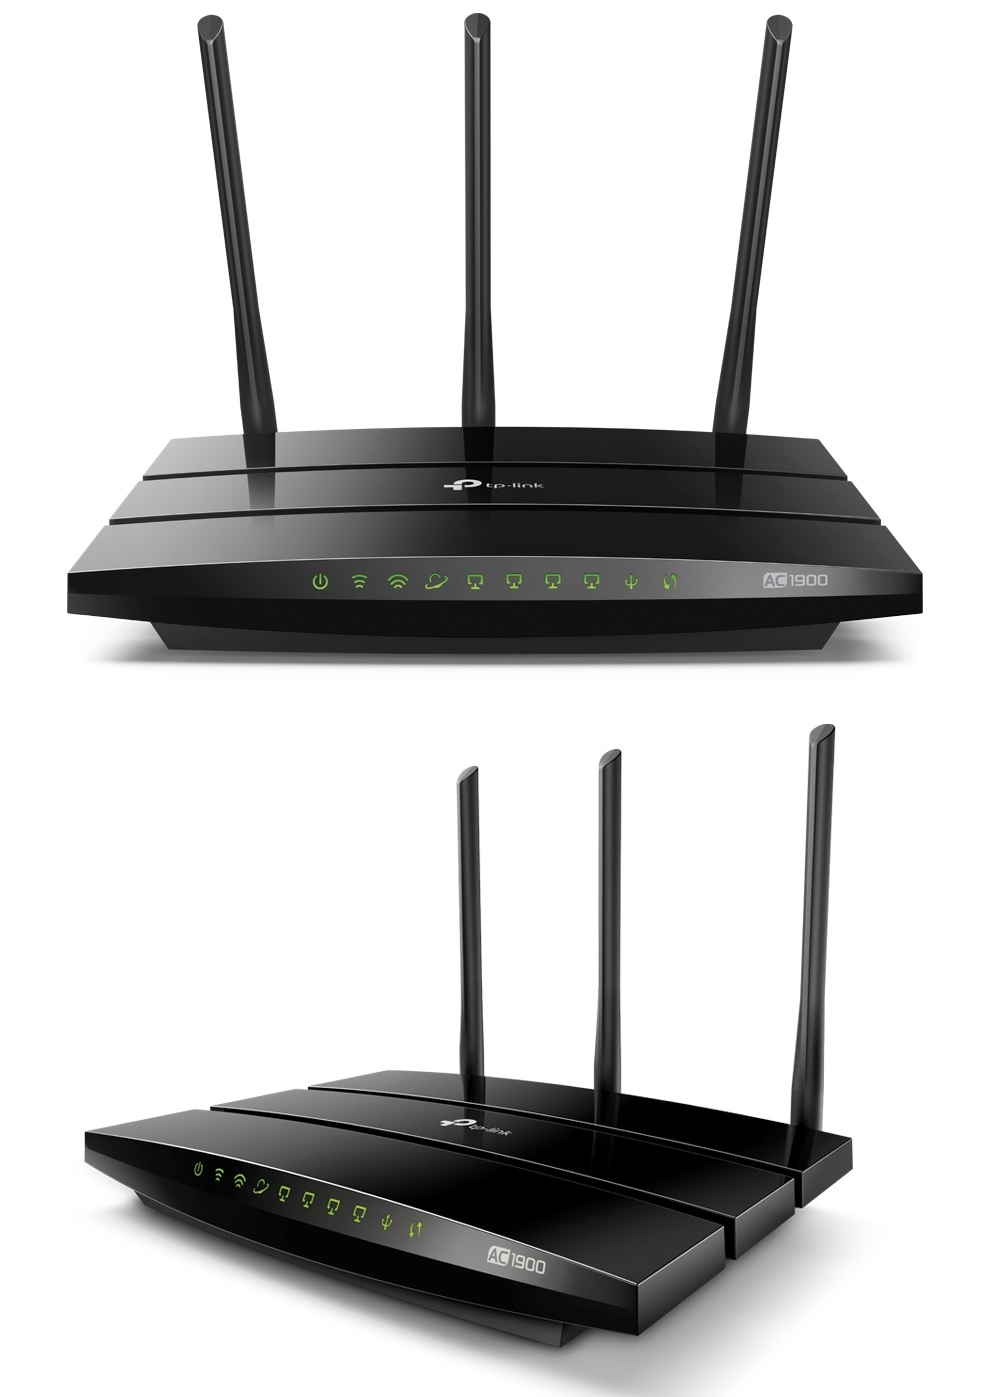 TP-Link Archer A9: Nový gigabitový MU-MIMO router s podporou Amazon Alexa a WPA3